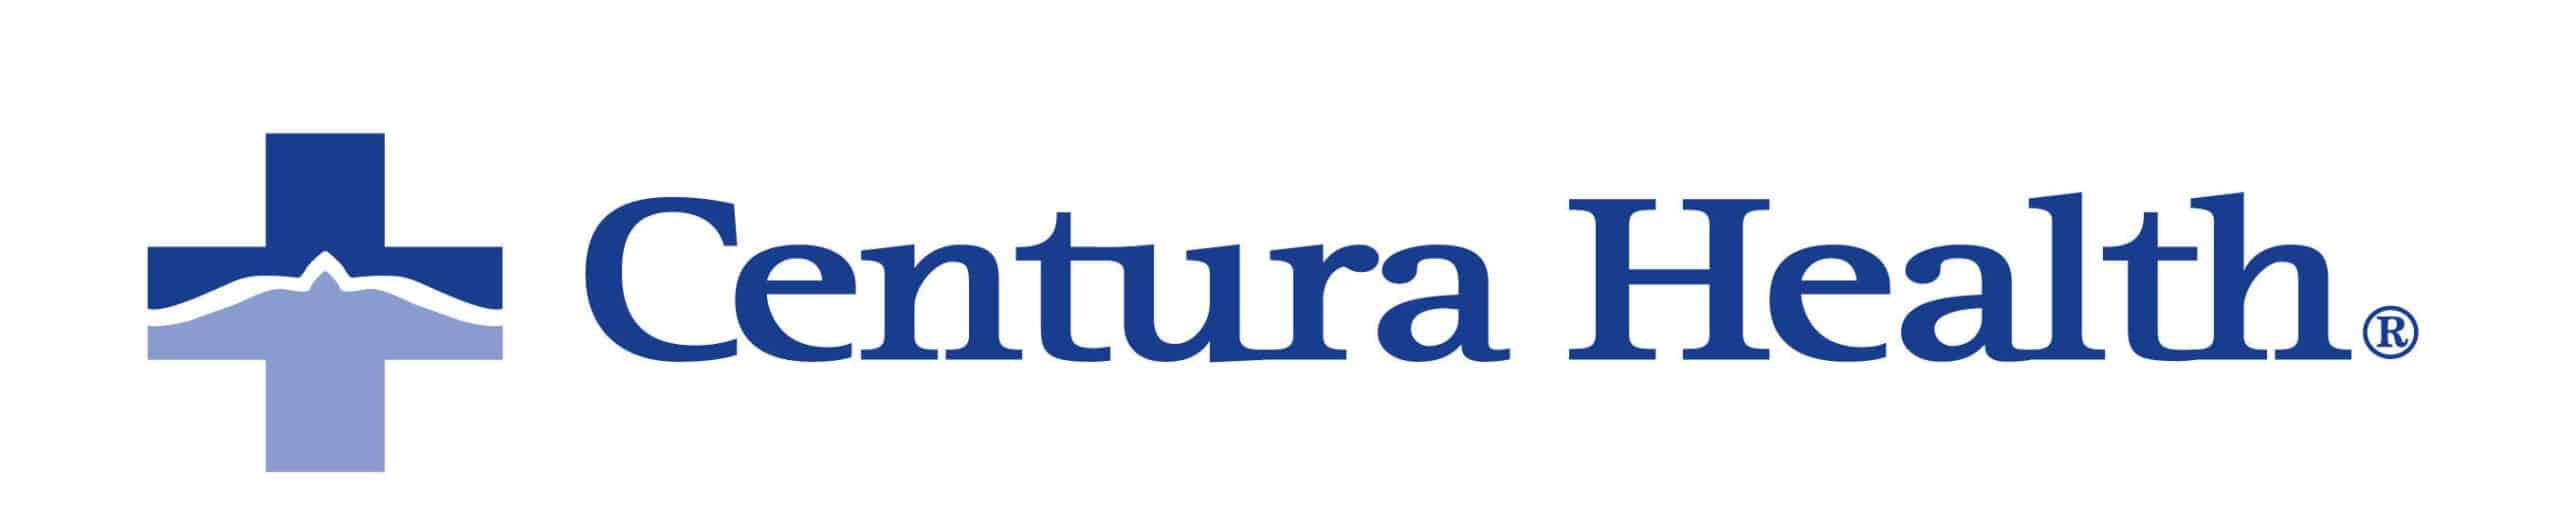 Centura Health Logo (PRNewsFoto/Centura Health)